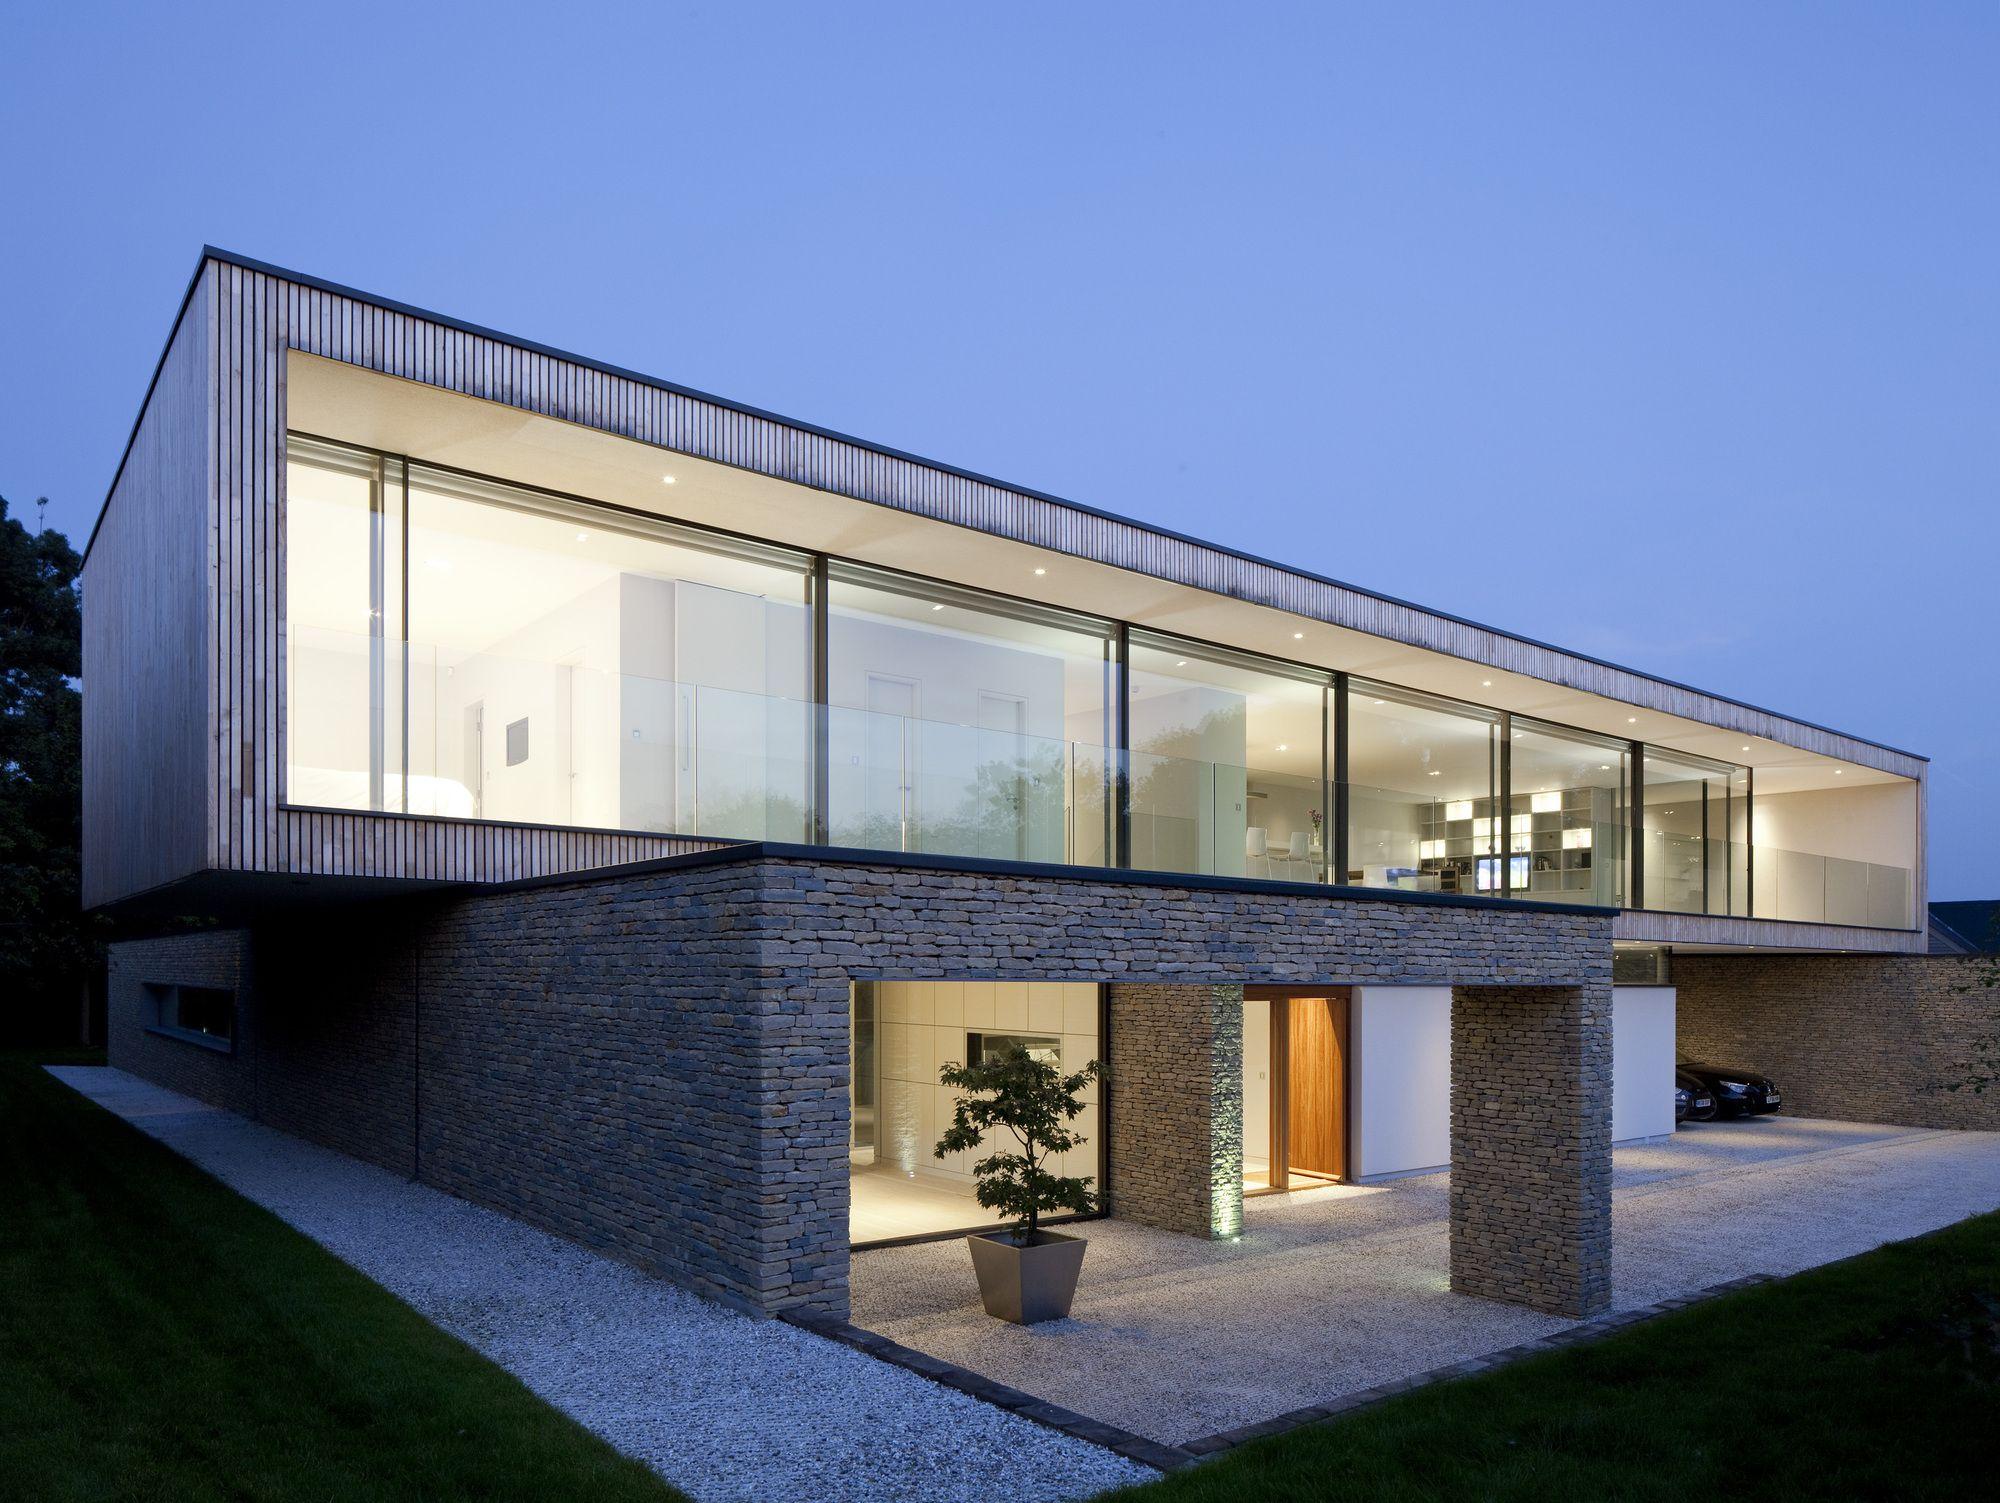 50331d7728ba0d1c29000058_hurst-house-john-pardey-architects-str-m-architects_strom_architects_hurst_house_03.jpg (2000×1503)